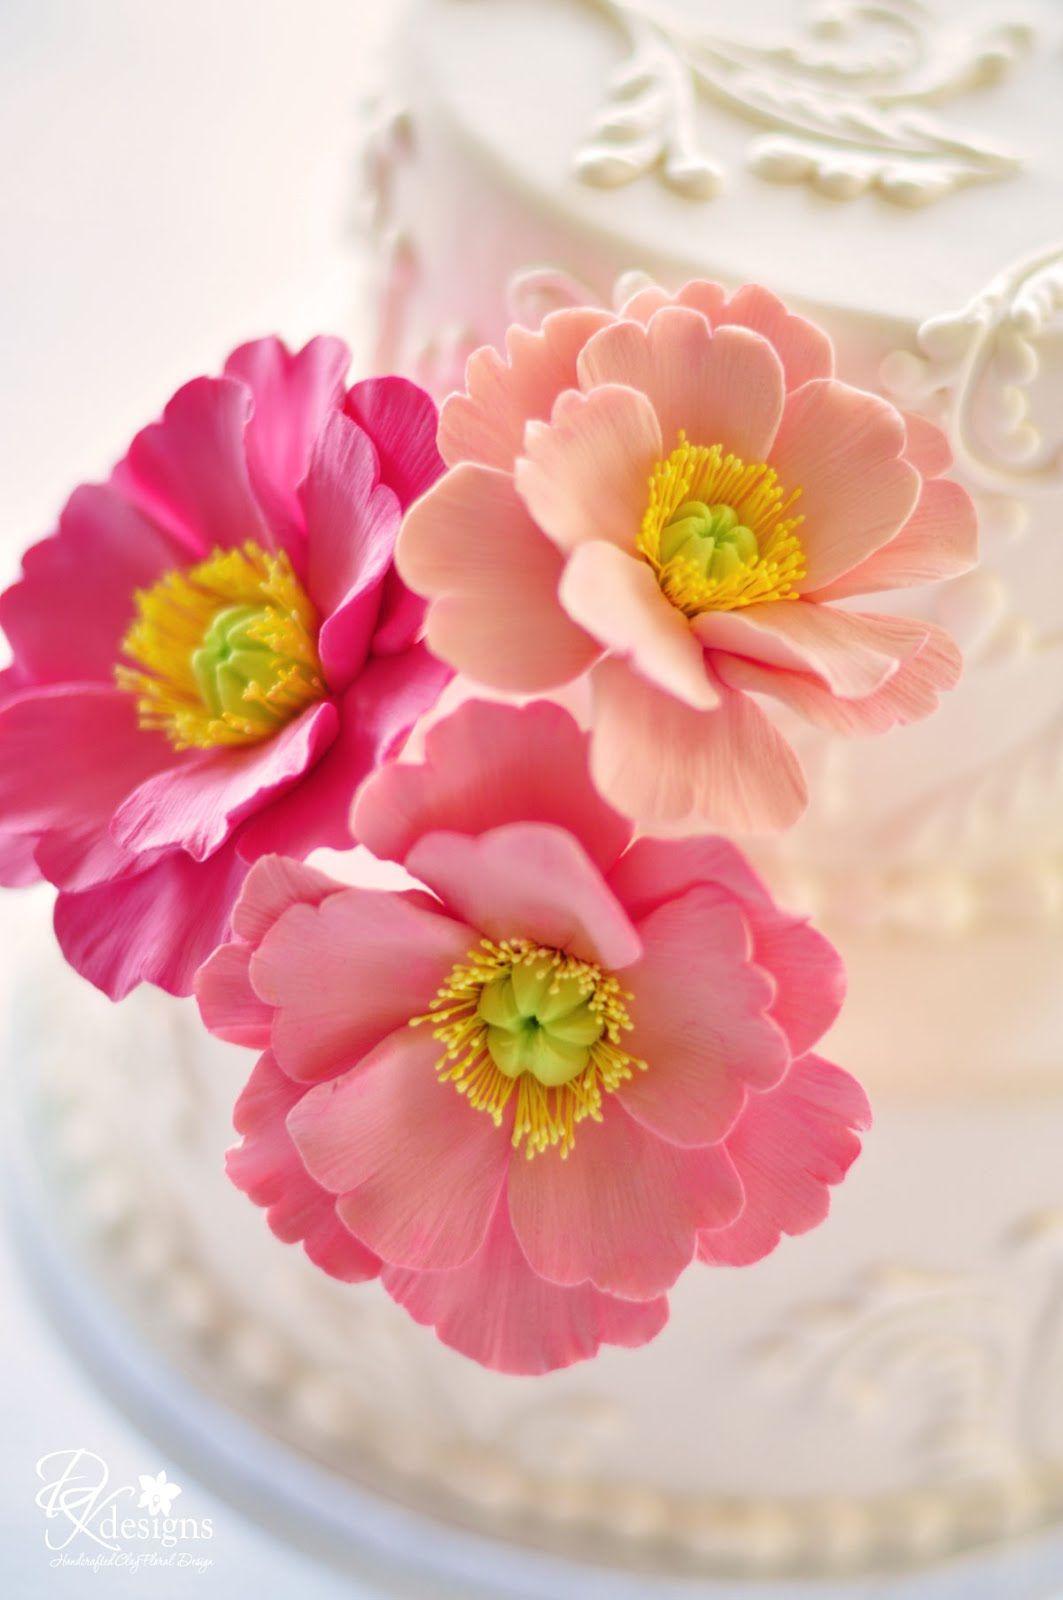 Dk designs new poppy cake flower trio in two shades lemon yellow dk designs new poppy cake flower trio in two shades lemon yellow mightylinksfo